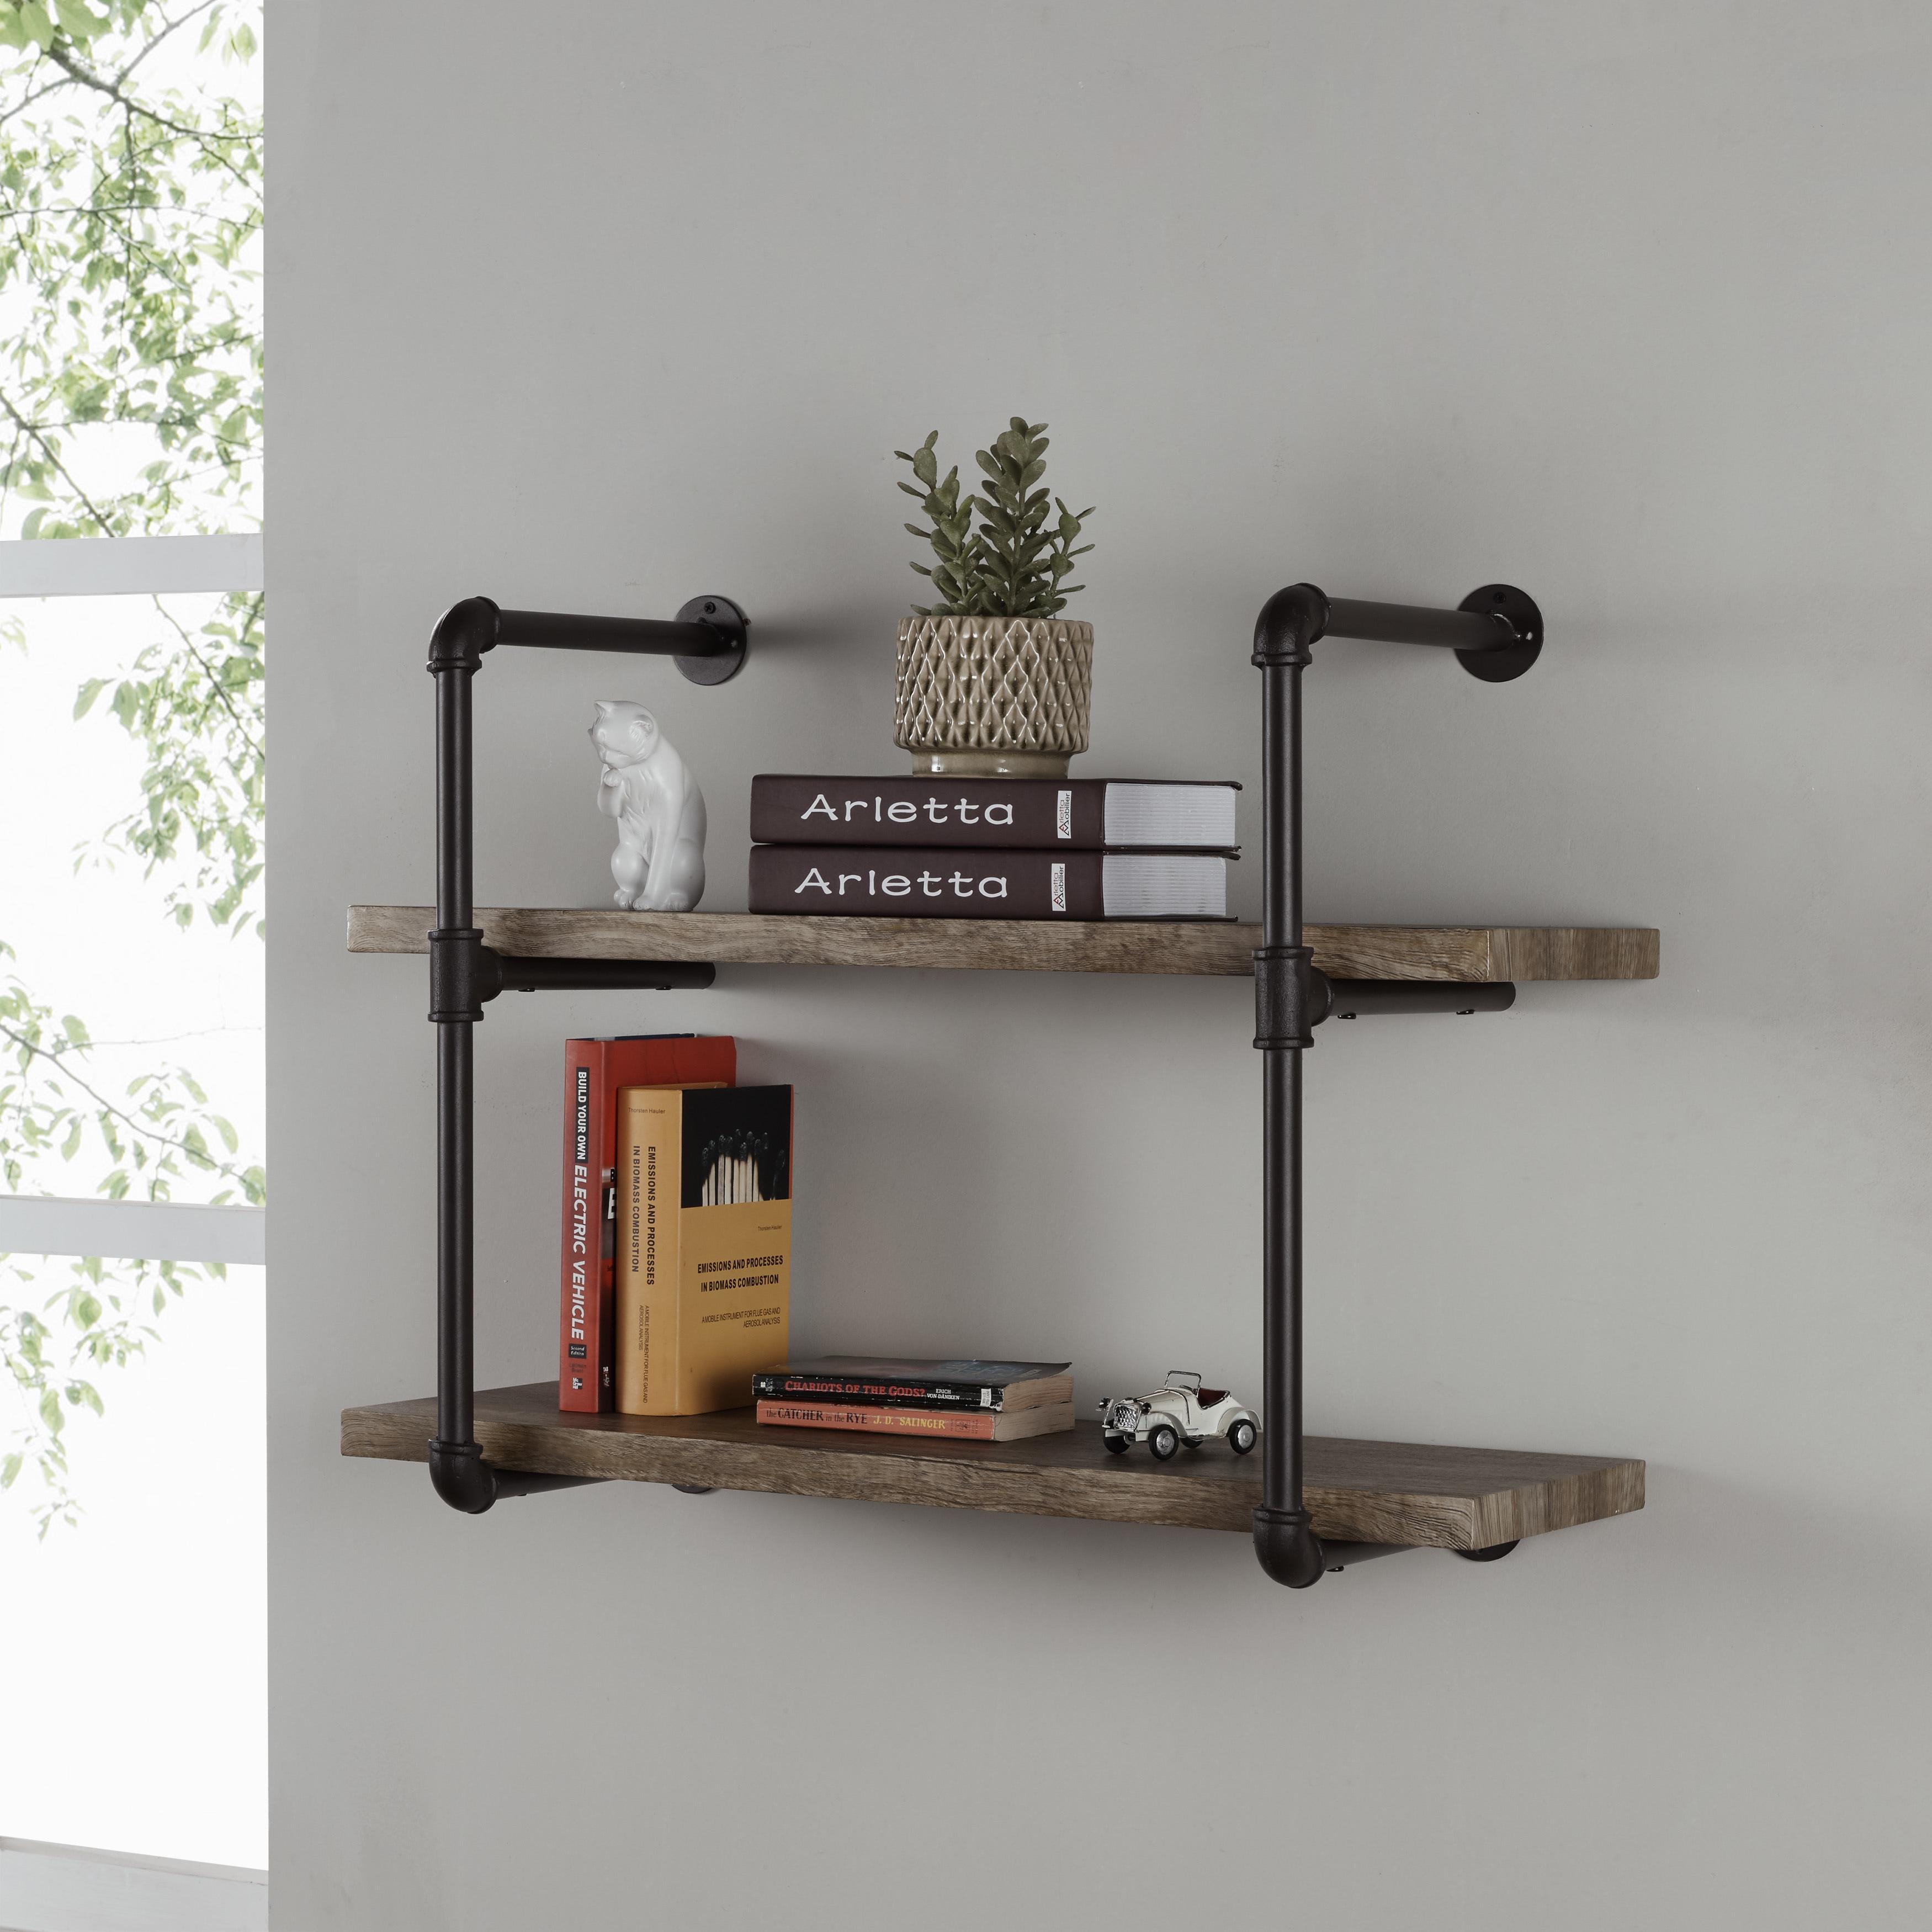 buy decorative shelves accent pieces online at overstock com our rh overstock com decorative shelves for wall decorative shelves for walls ideas